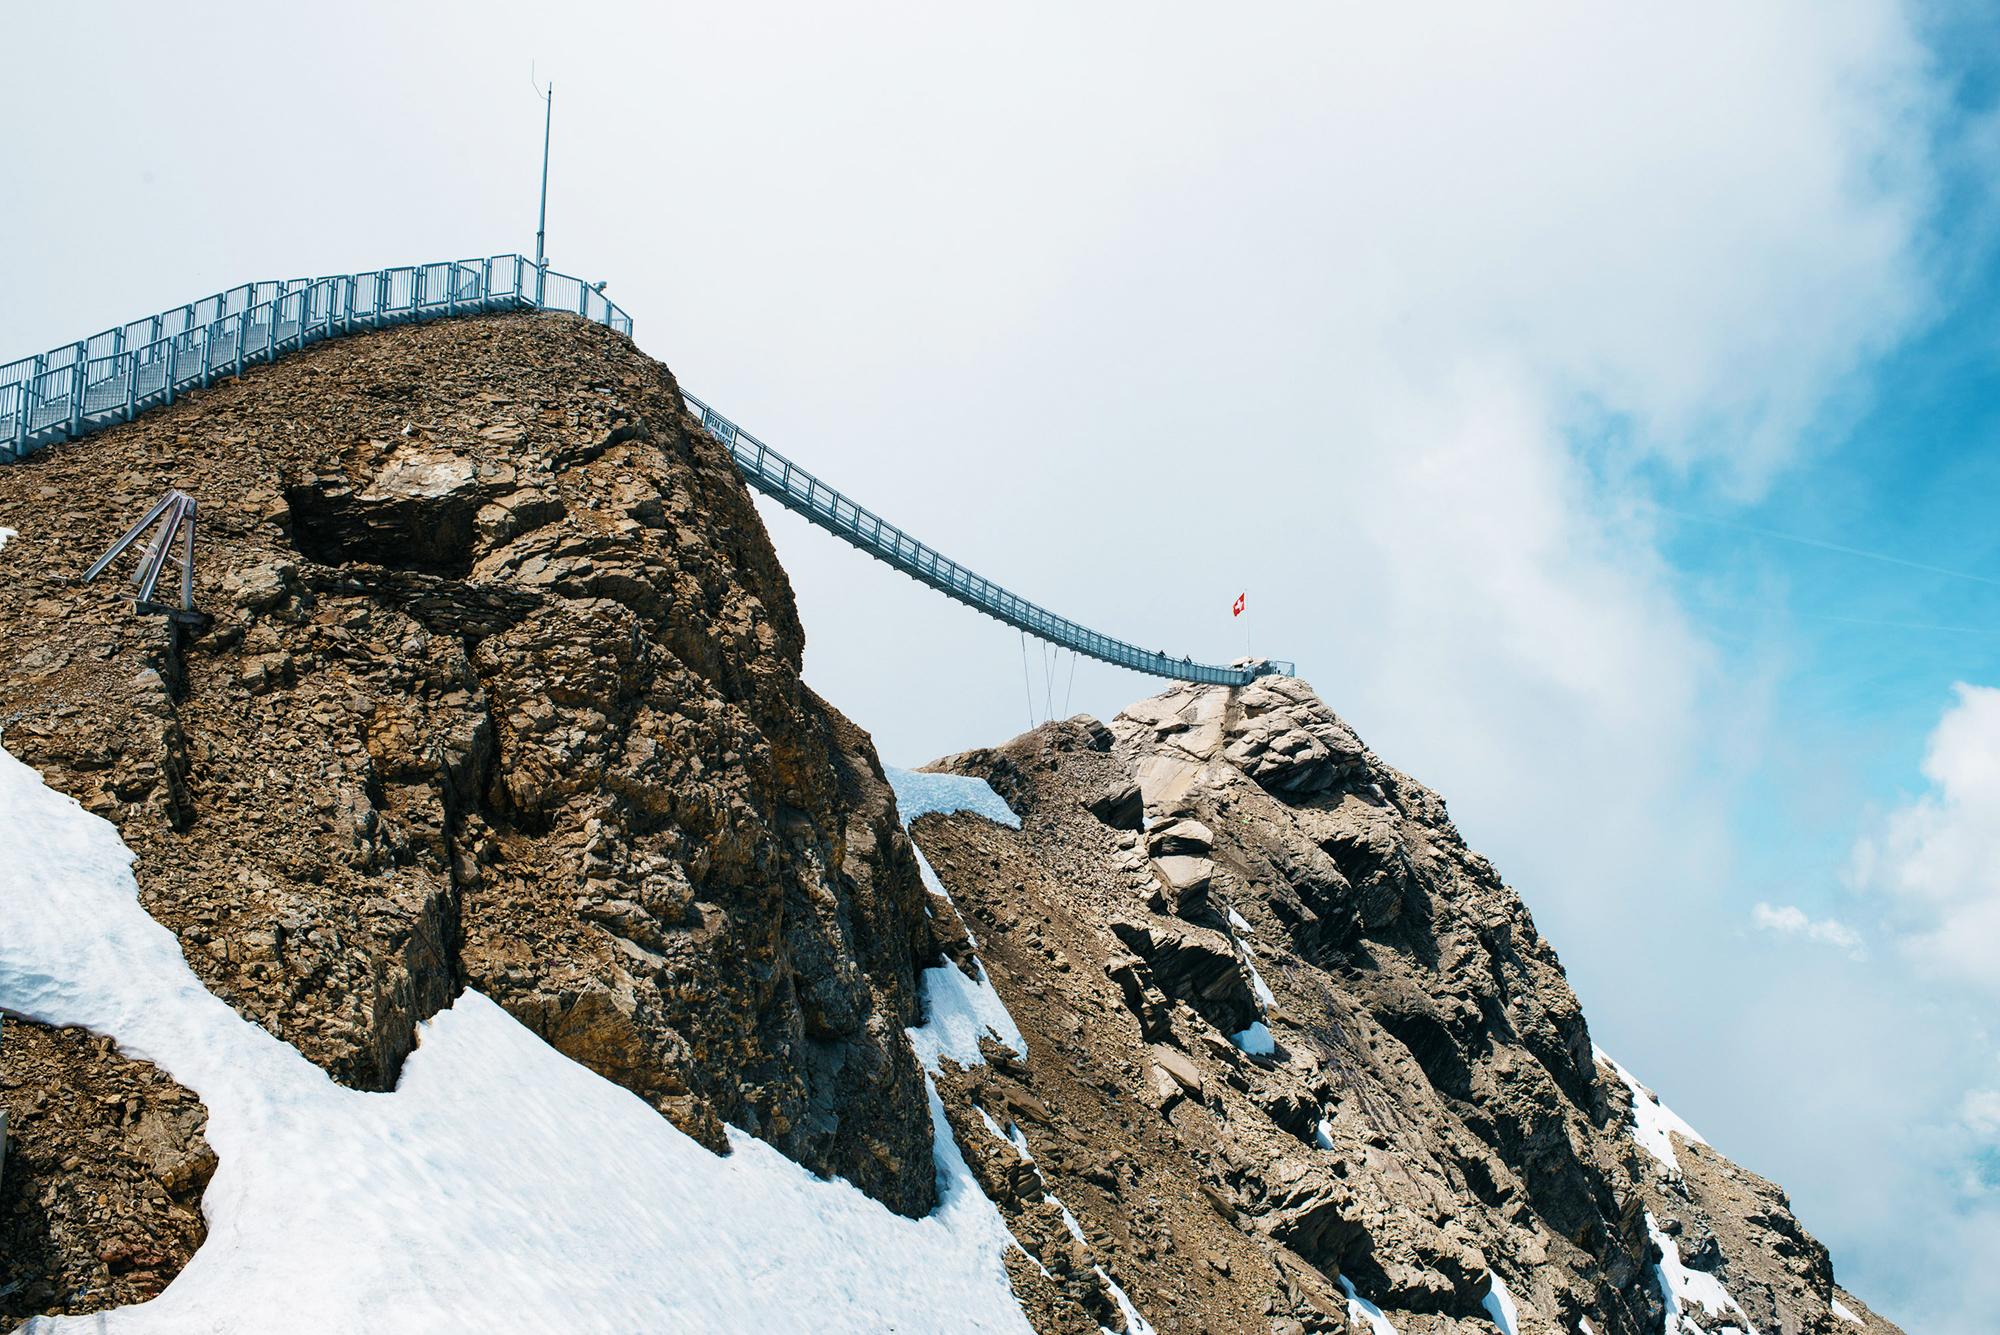 kt_2020_320_Keytours_excursions_Swisstours_glacier3000_peak_walk4_2048_10